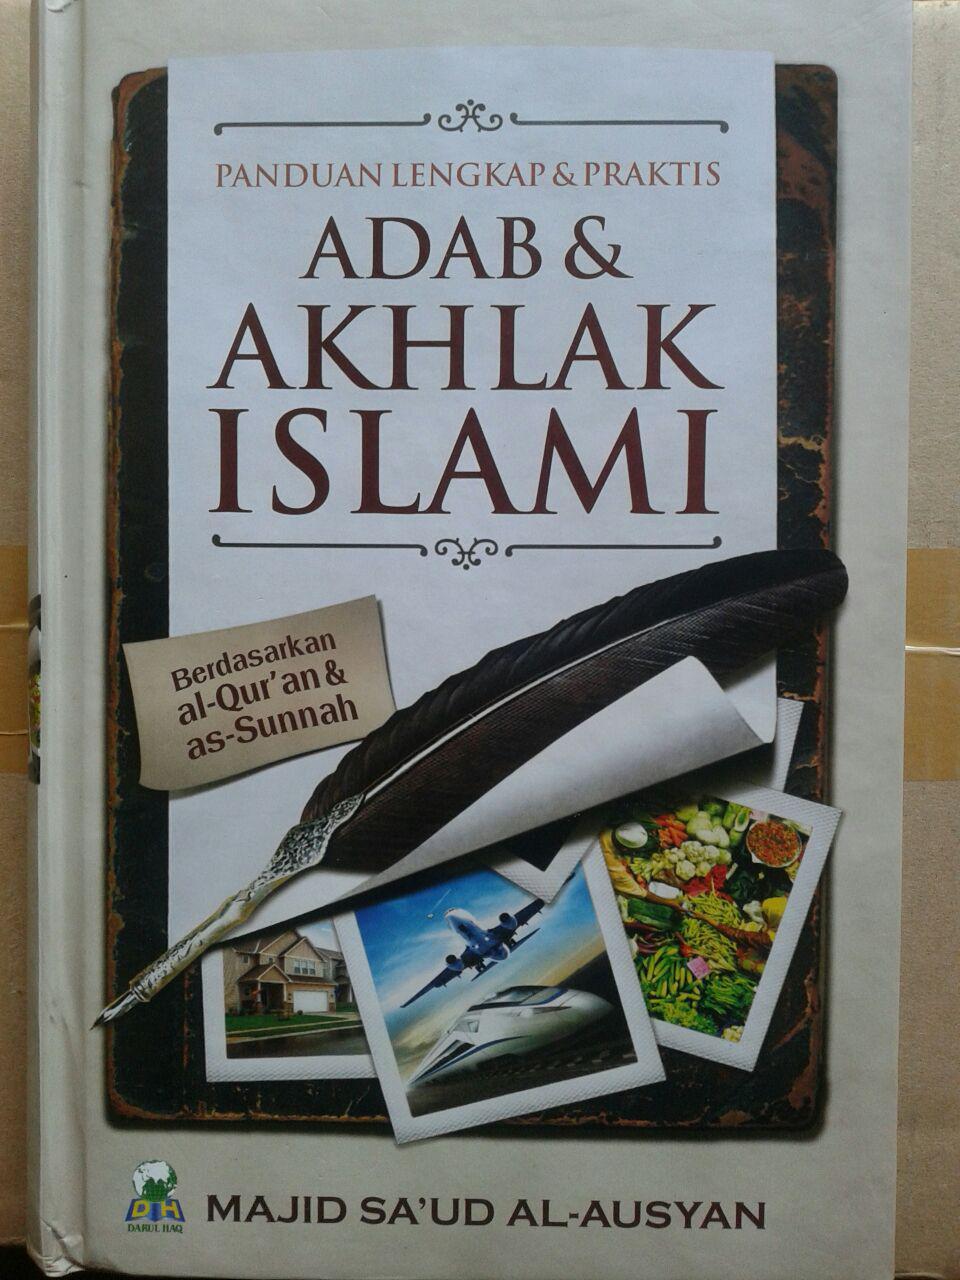 Buku Panduan Lengkap Praktis Adab dan Akhlak Islami cover